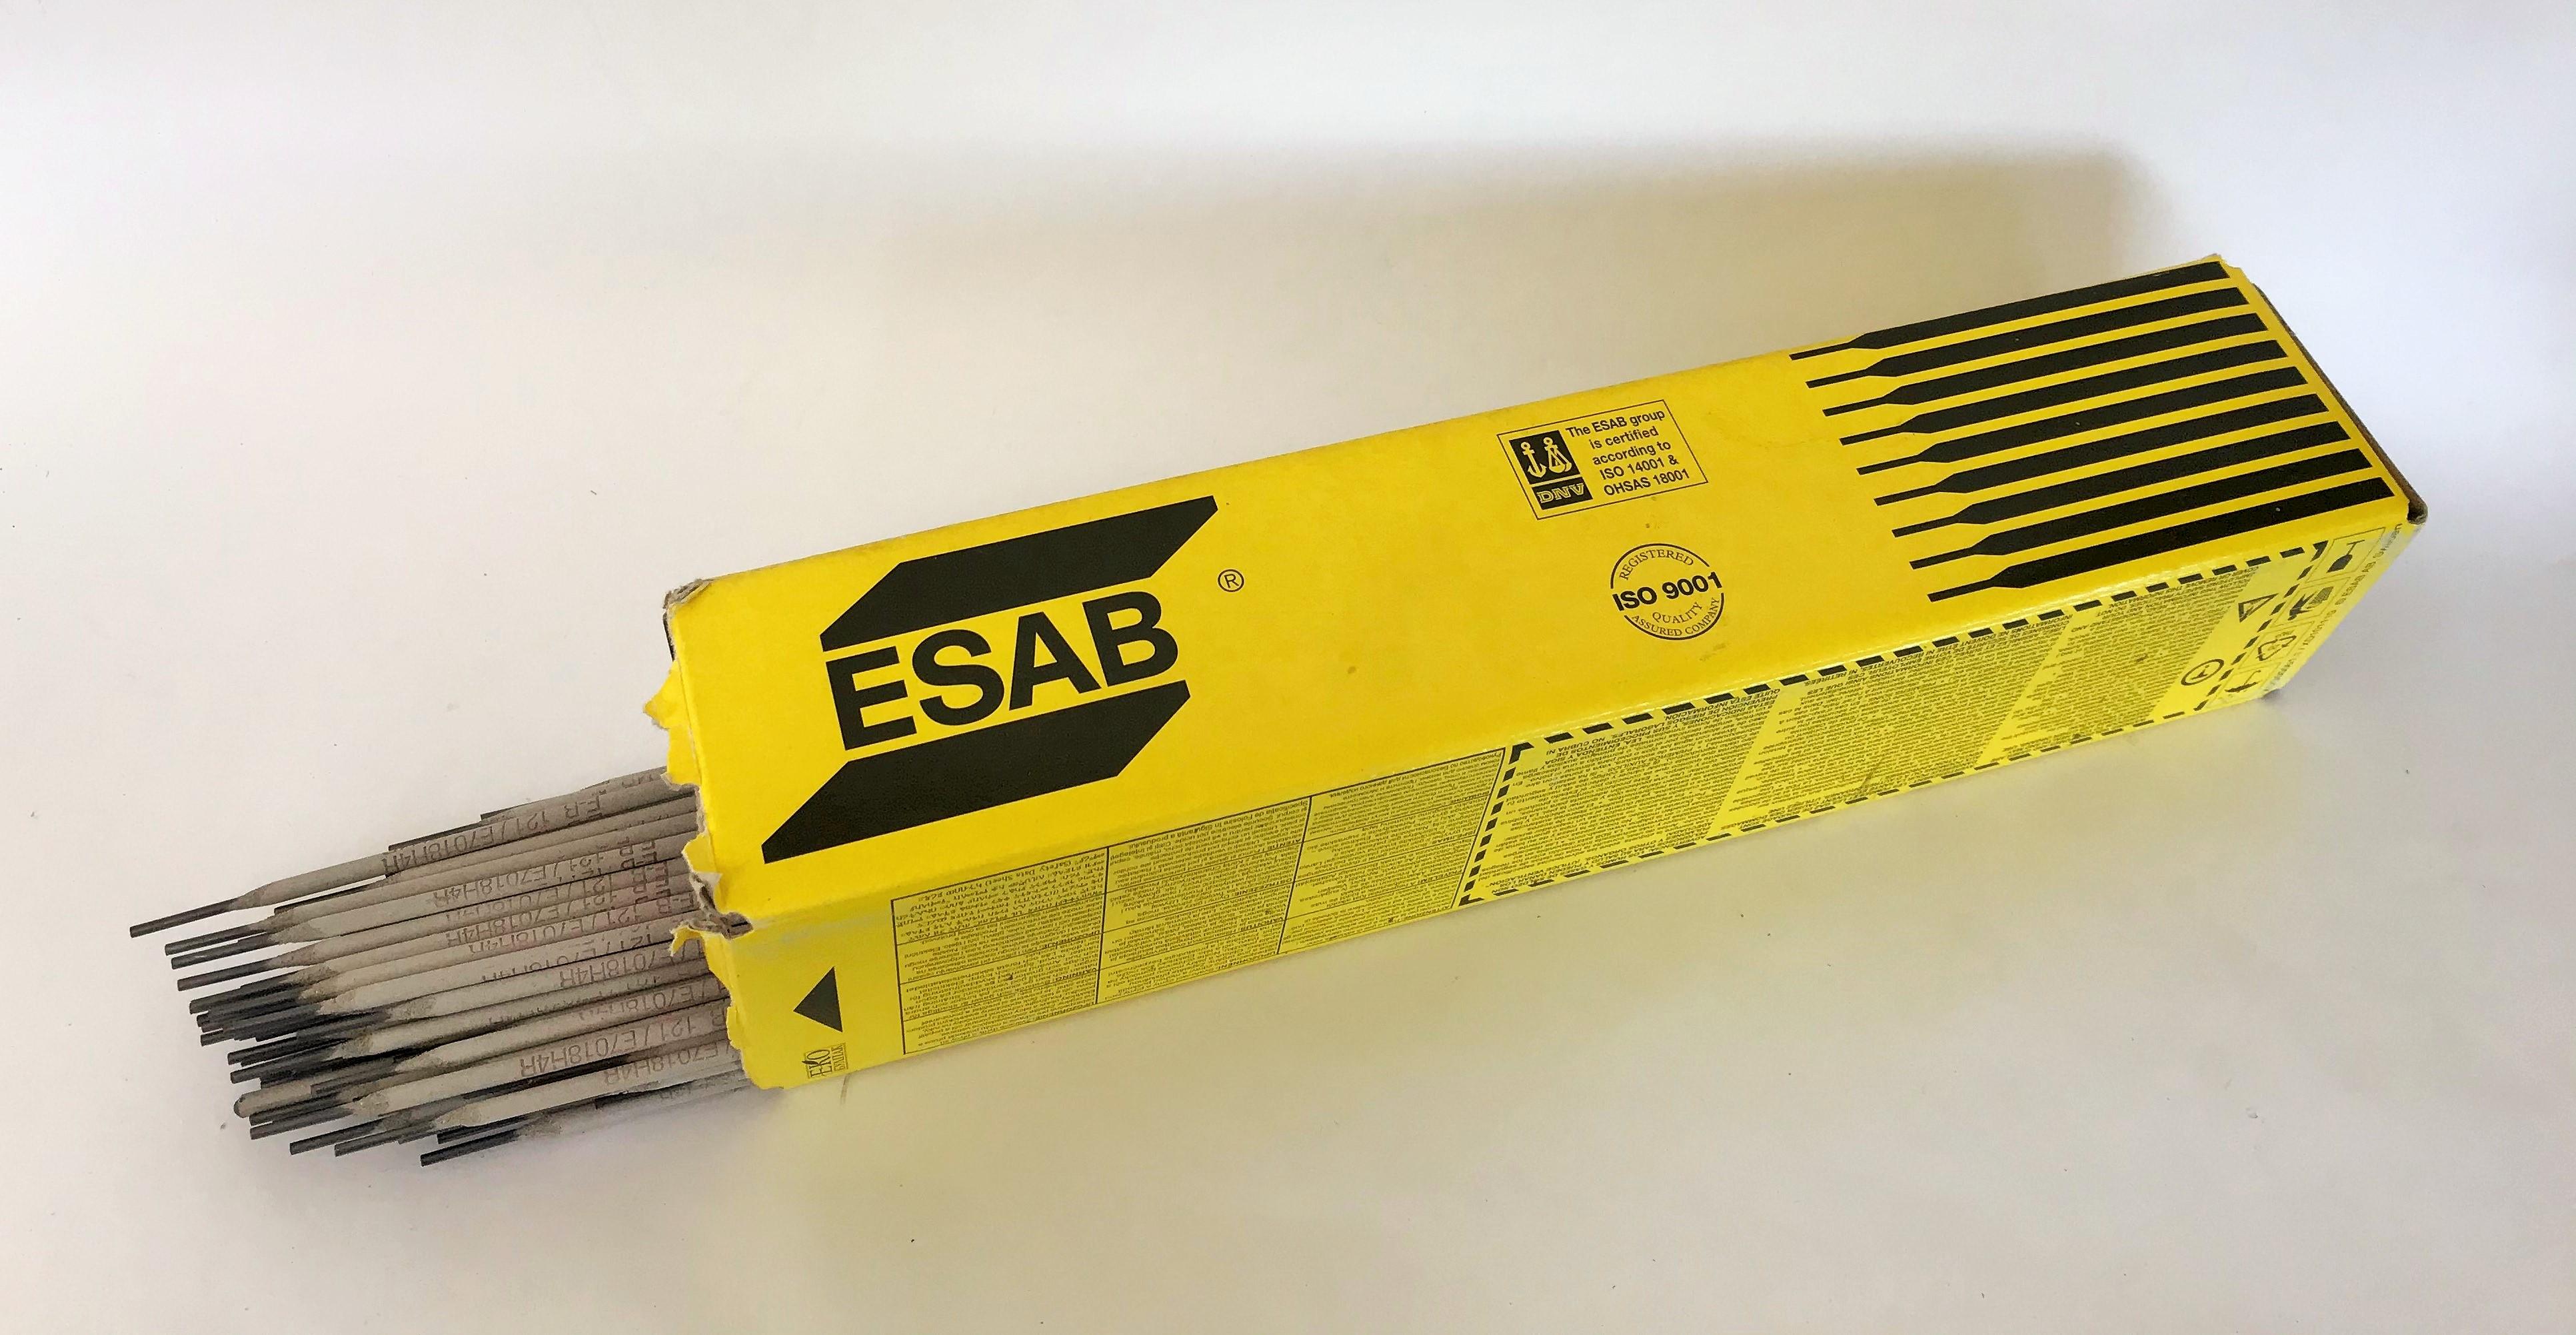 Elektrody basické EB 123, Ǿ 2.0 - 3.2 mm x 300 - 450 mm ESAB® Kus: 2,00 mm